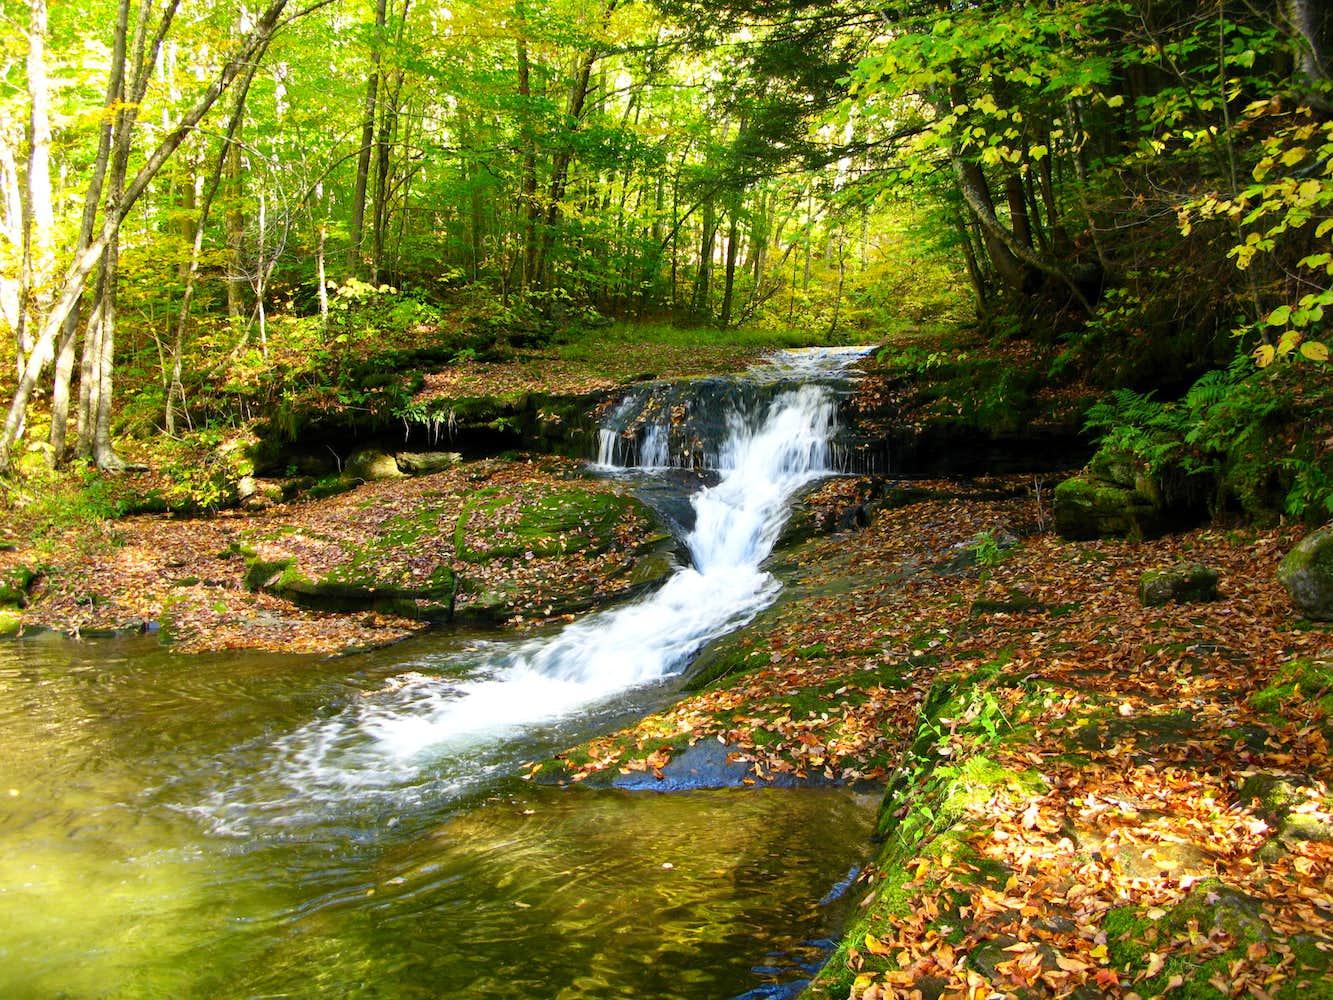 A Very Nice Little Waterfall : Photos, Diagrams & Topos